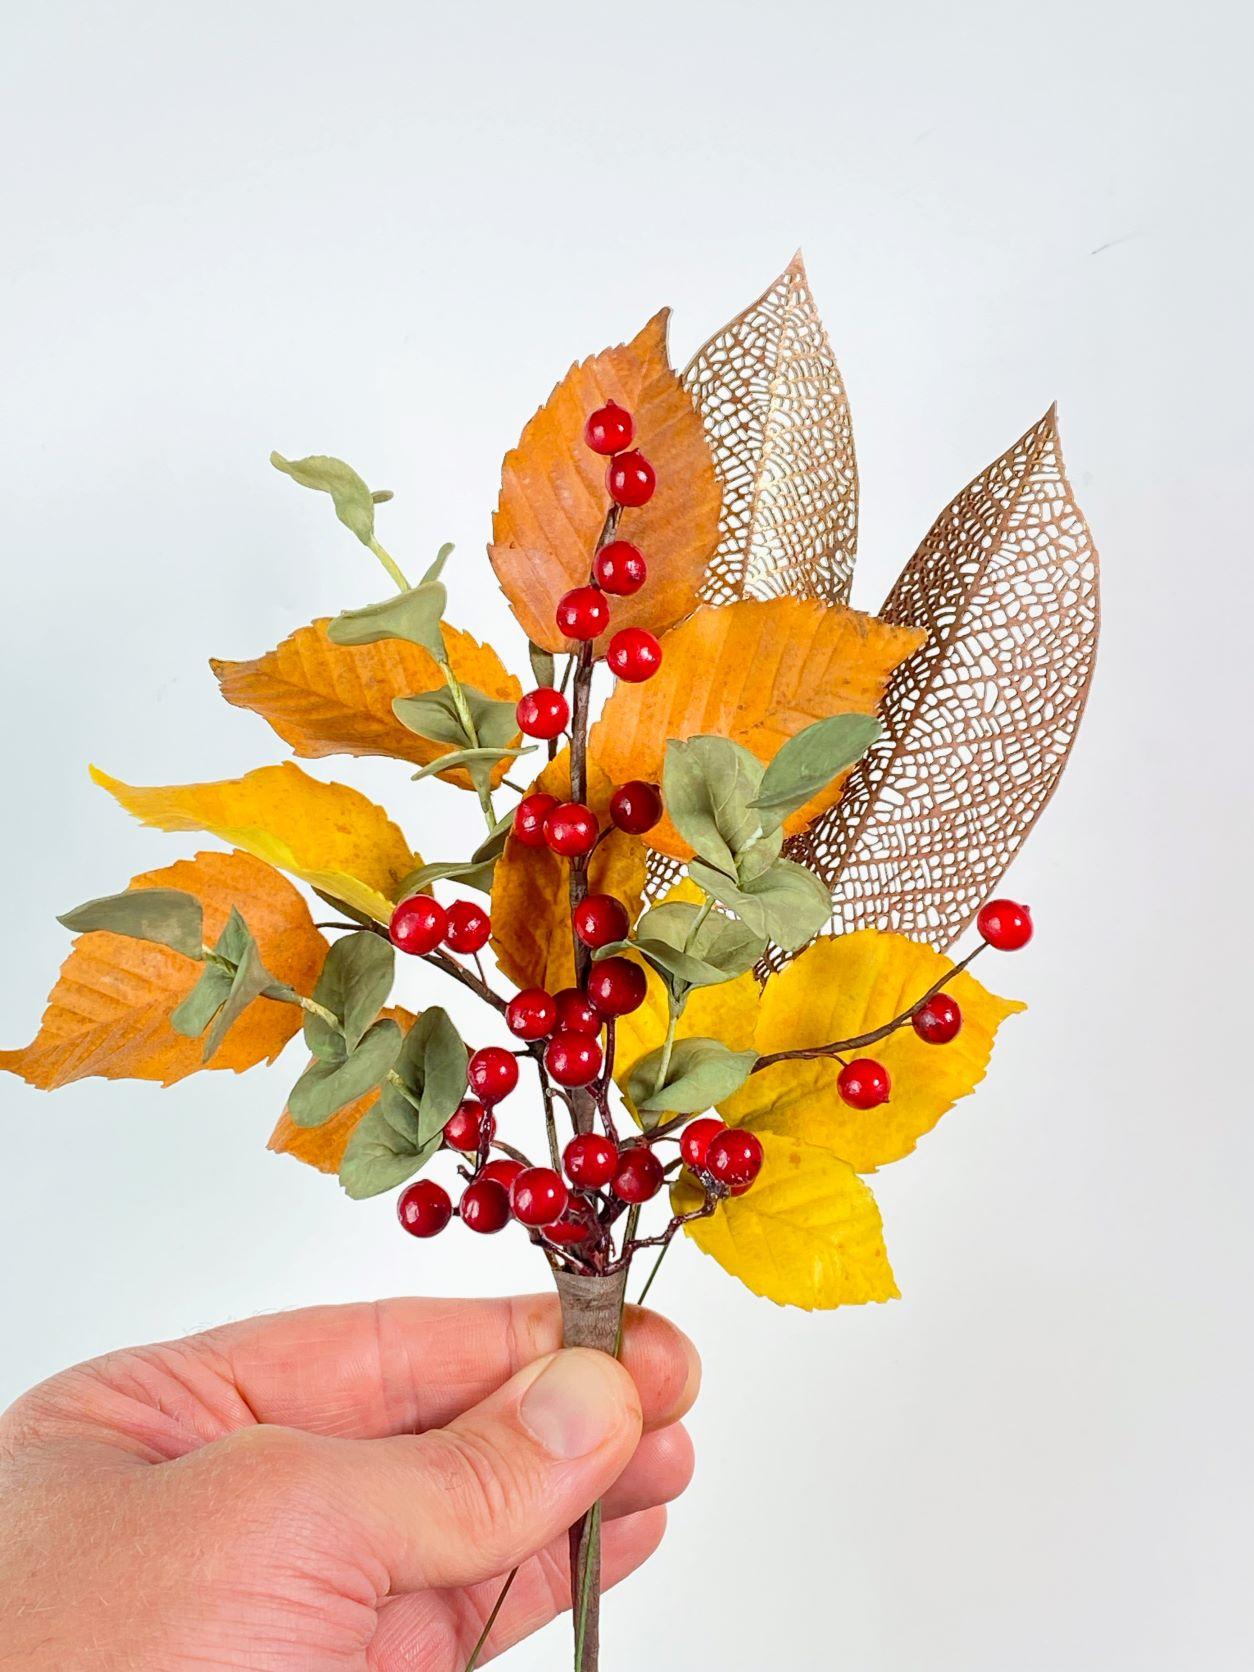 Assemble leaf springs from sugarpaste